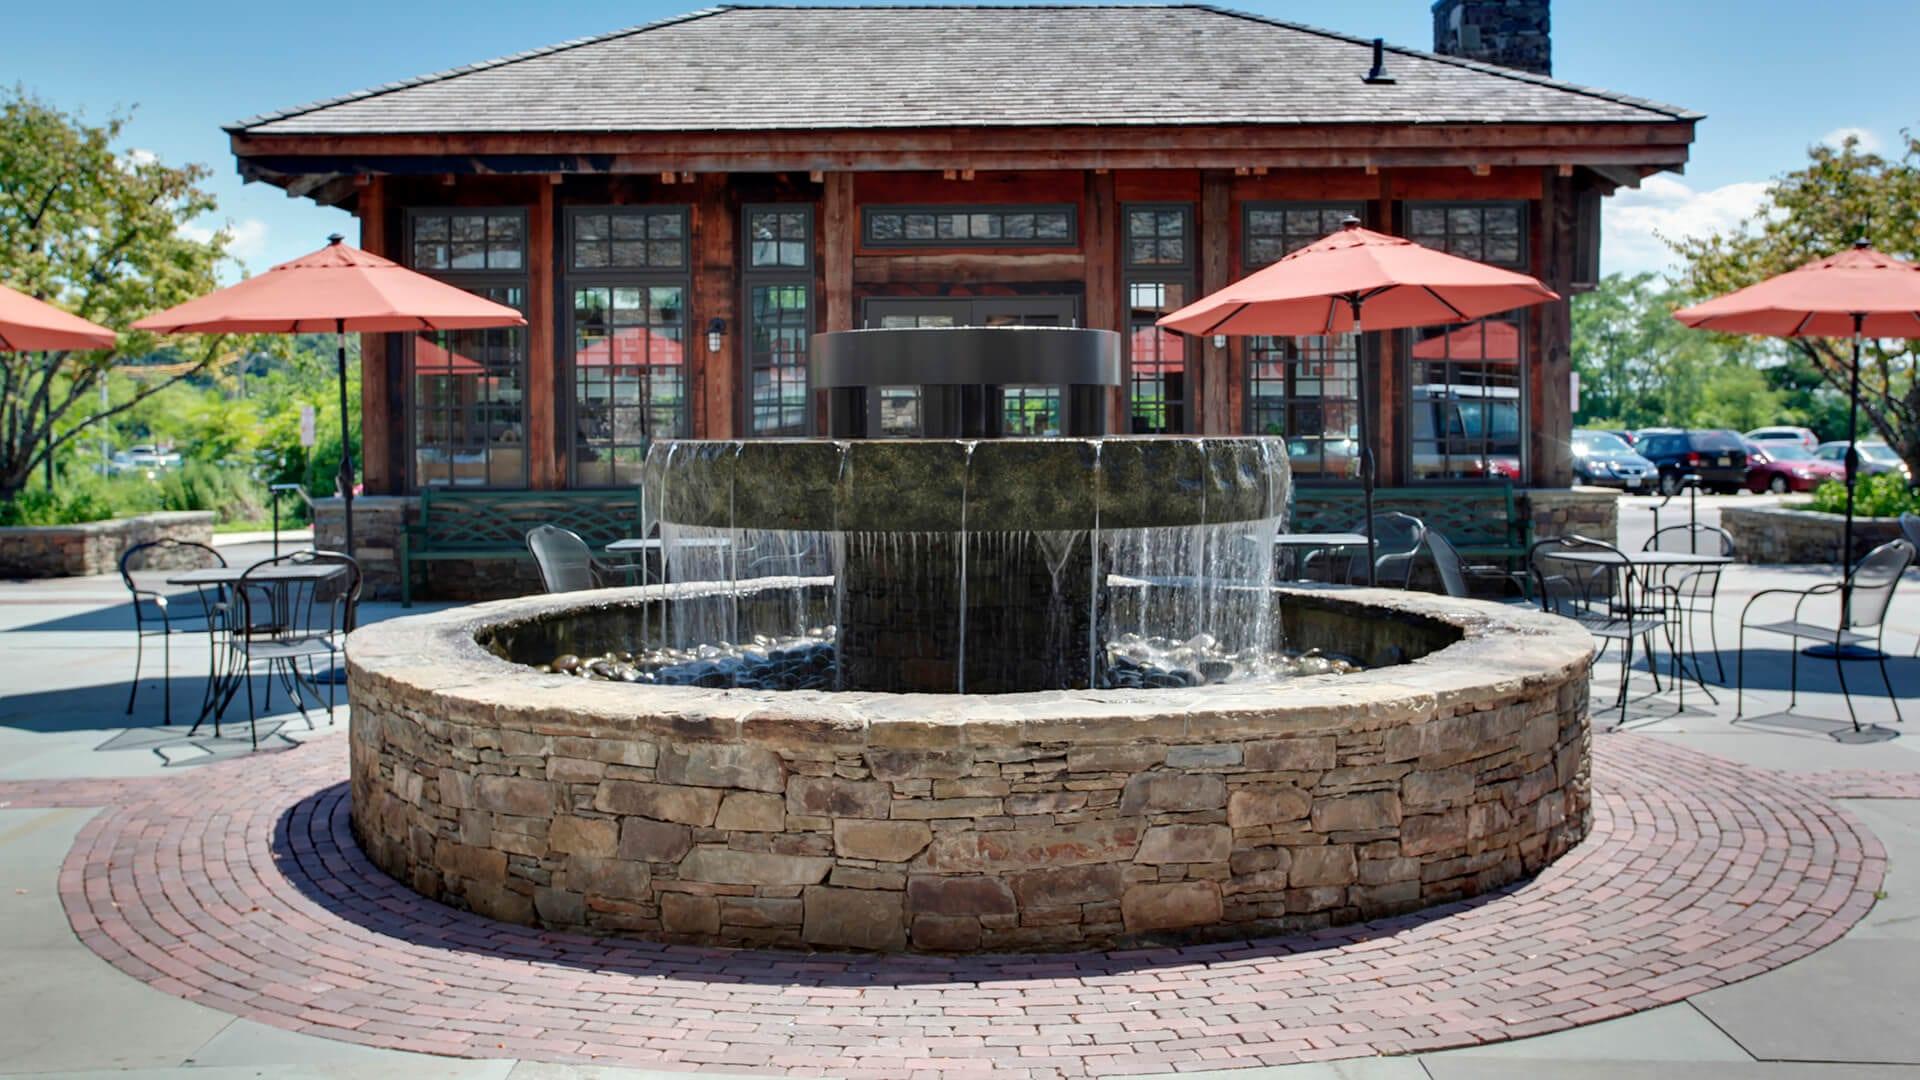 Decorative Fountain With Blue Stone & Brick Patio, Rrytown Ny